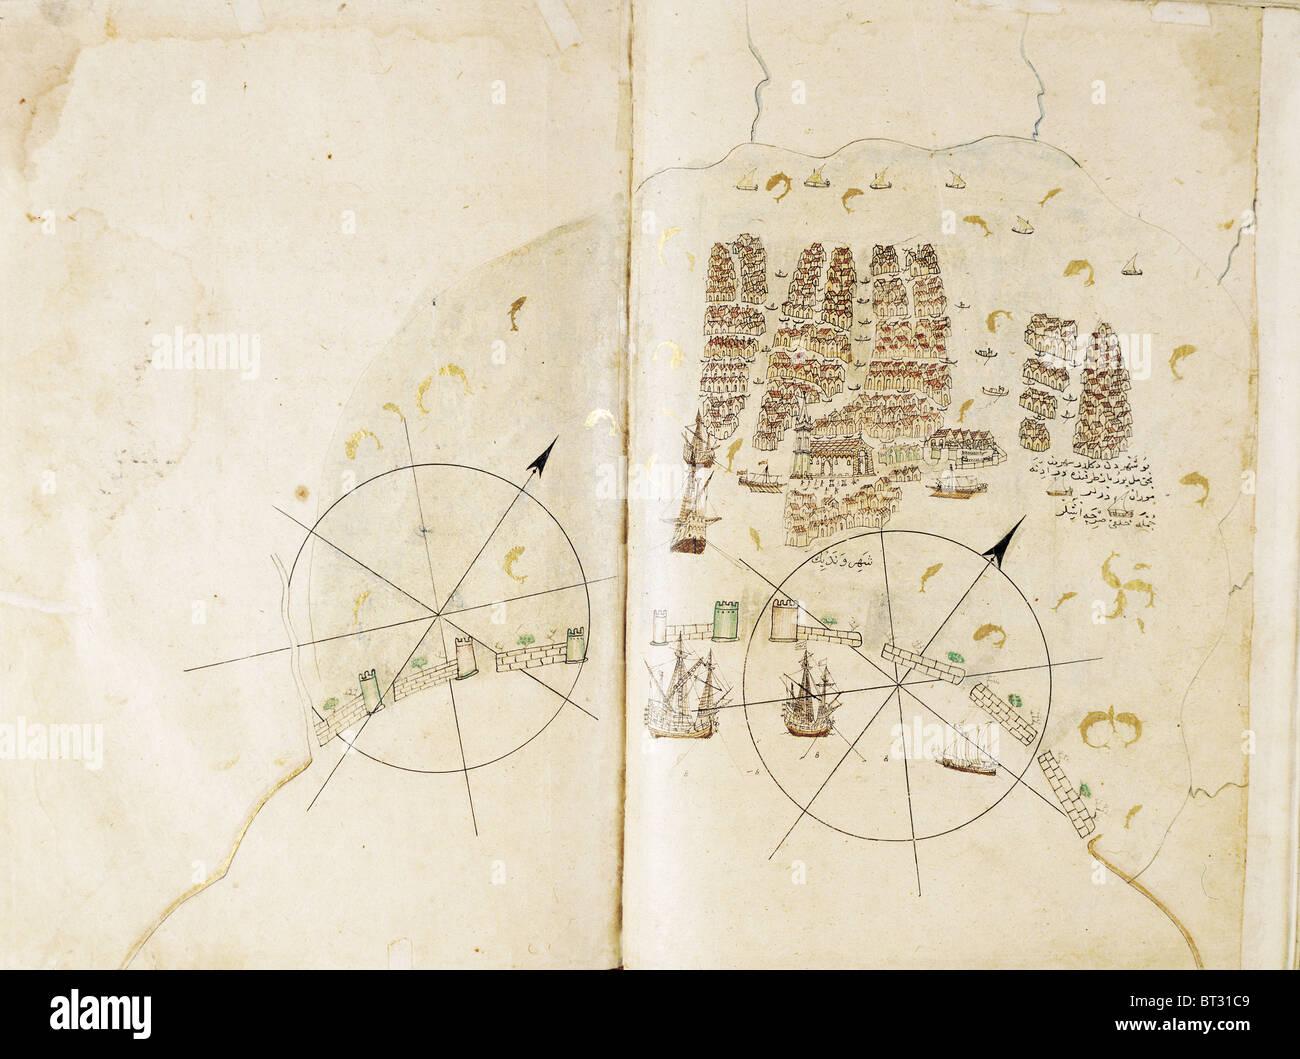 Historical chart of Venice by Piri Reis Kitab i Bahriye Istanbul university library Turkey - Stock Image